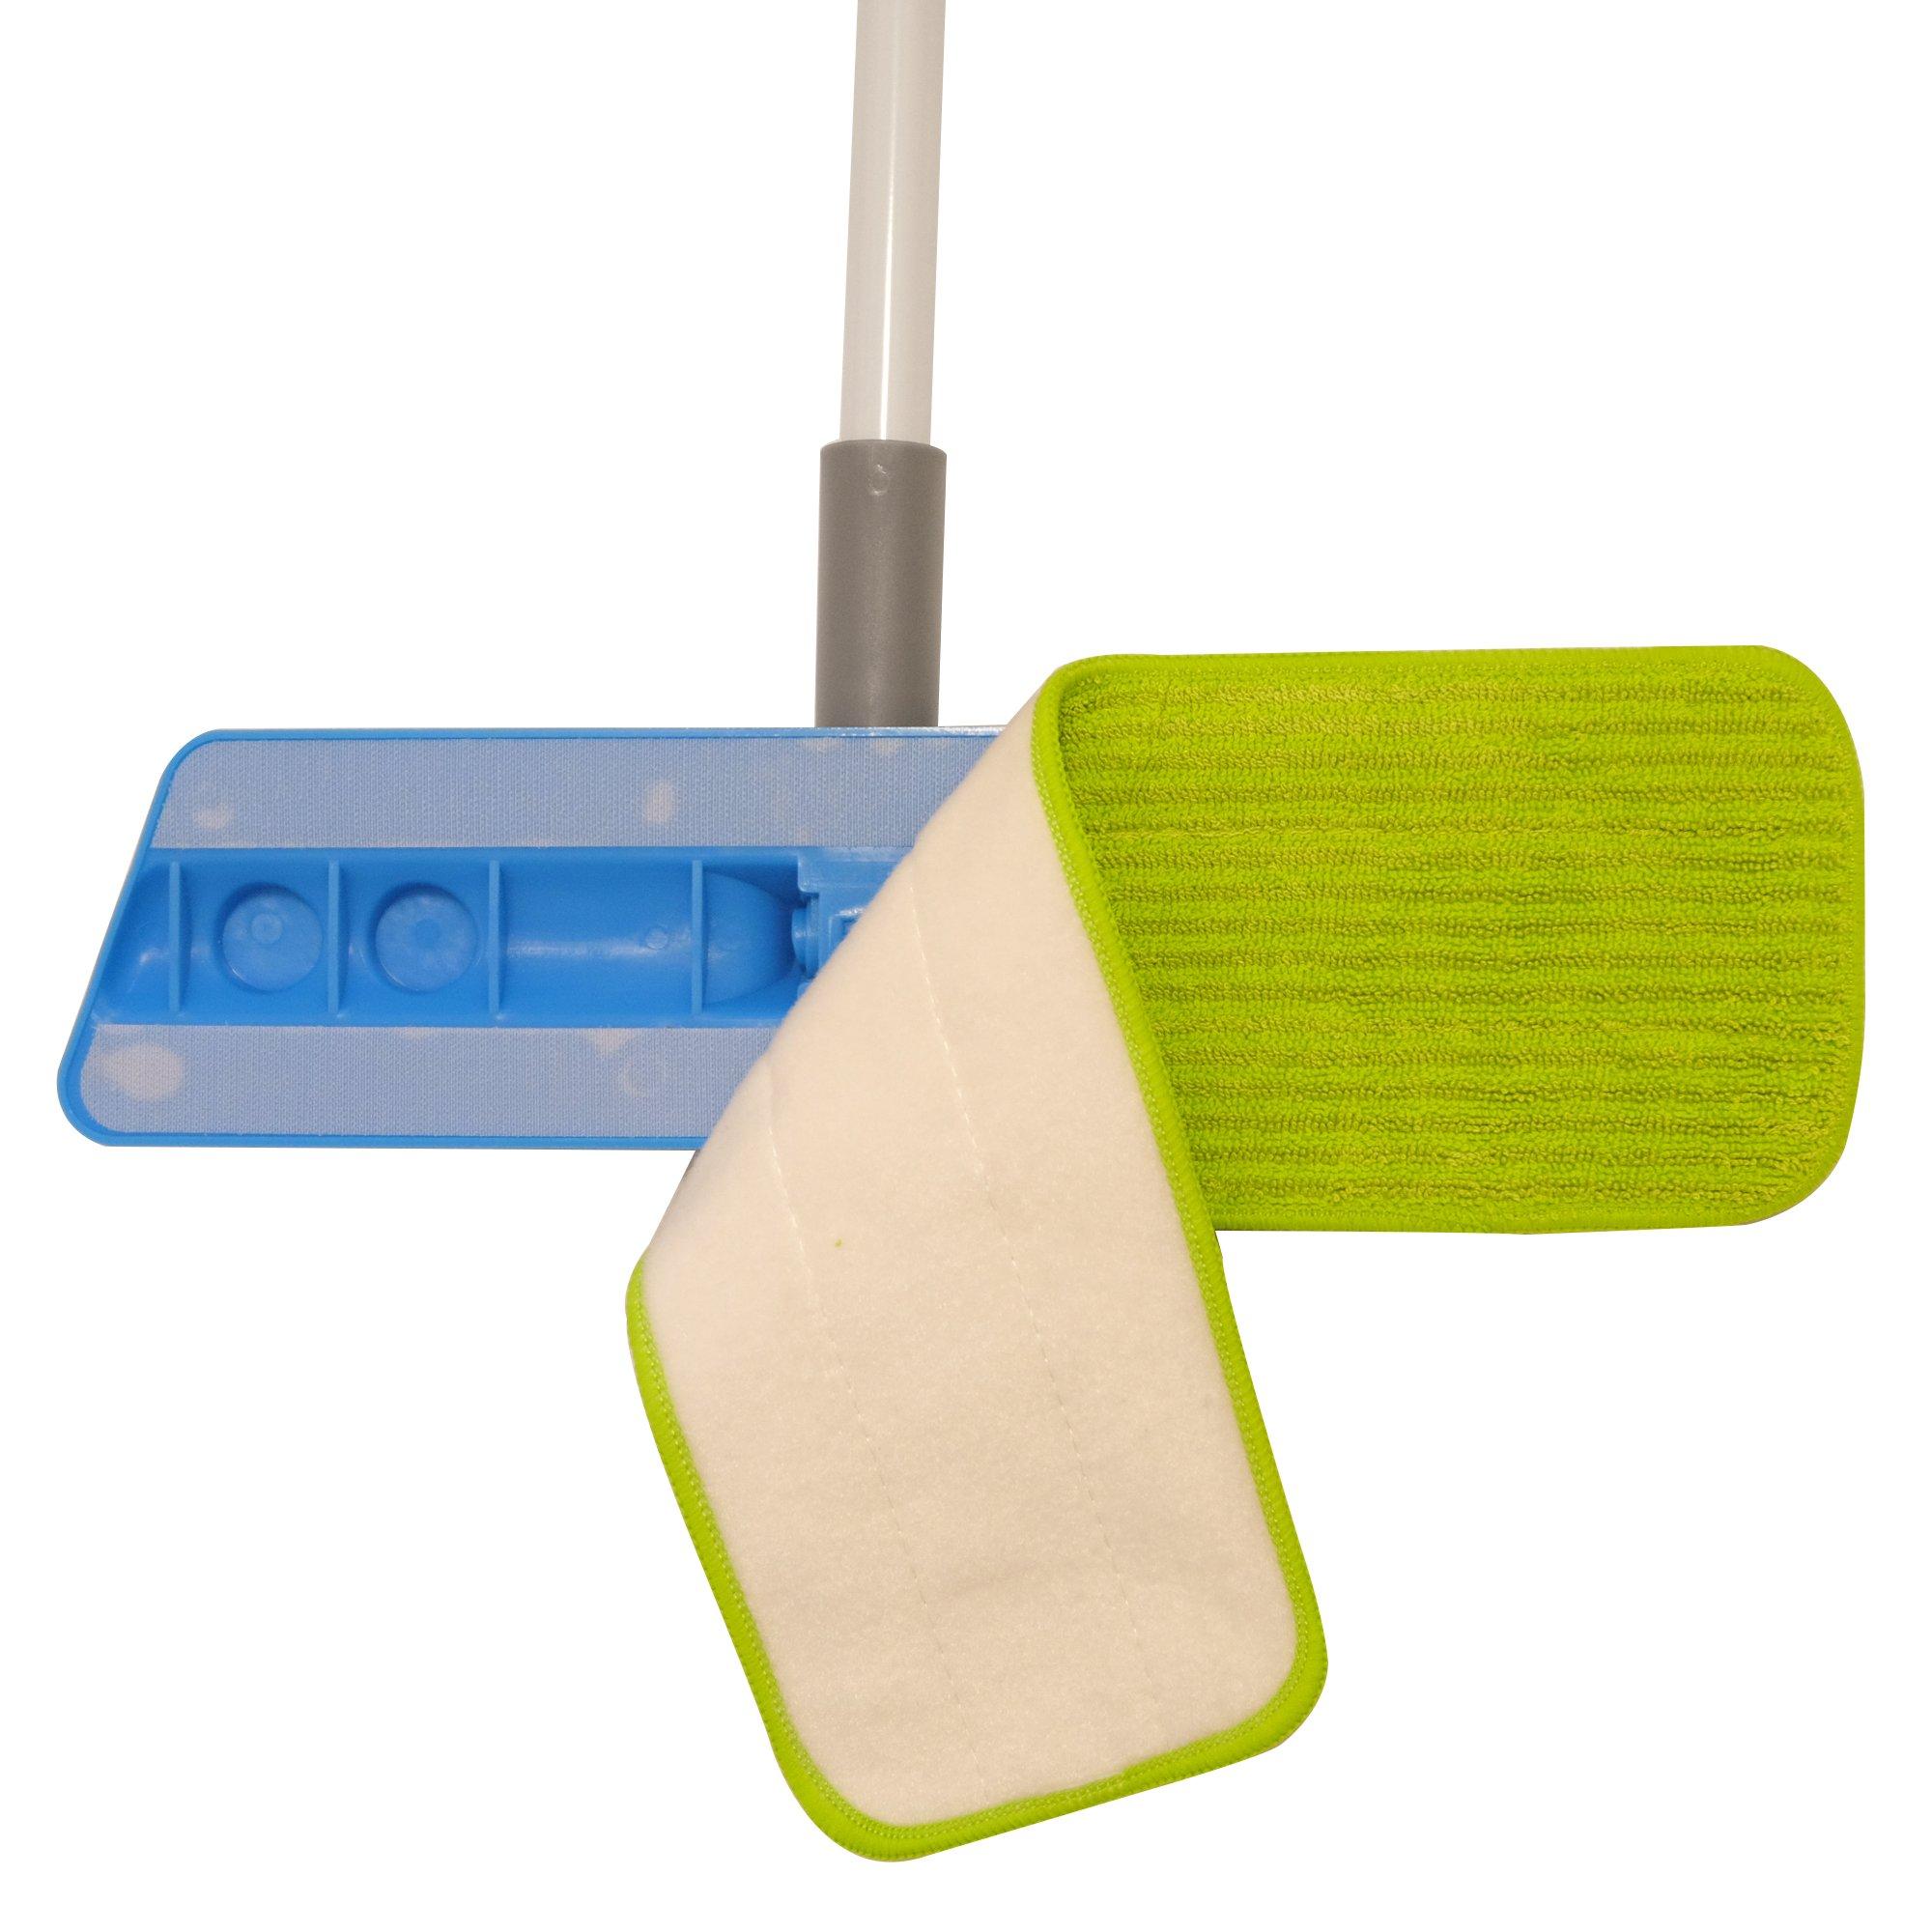 Microfiber Mop 18inch Velcro Wet & Dry Mop Refill for Hardwood Floors Set of 8 by Bear Family by Bear Family Microfiber (Image #5)